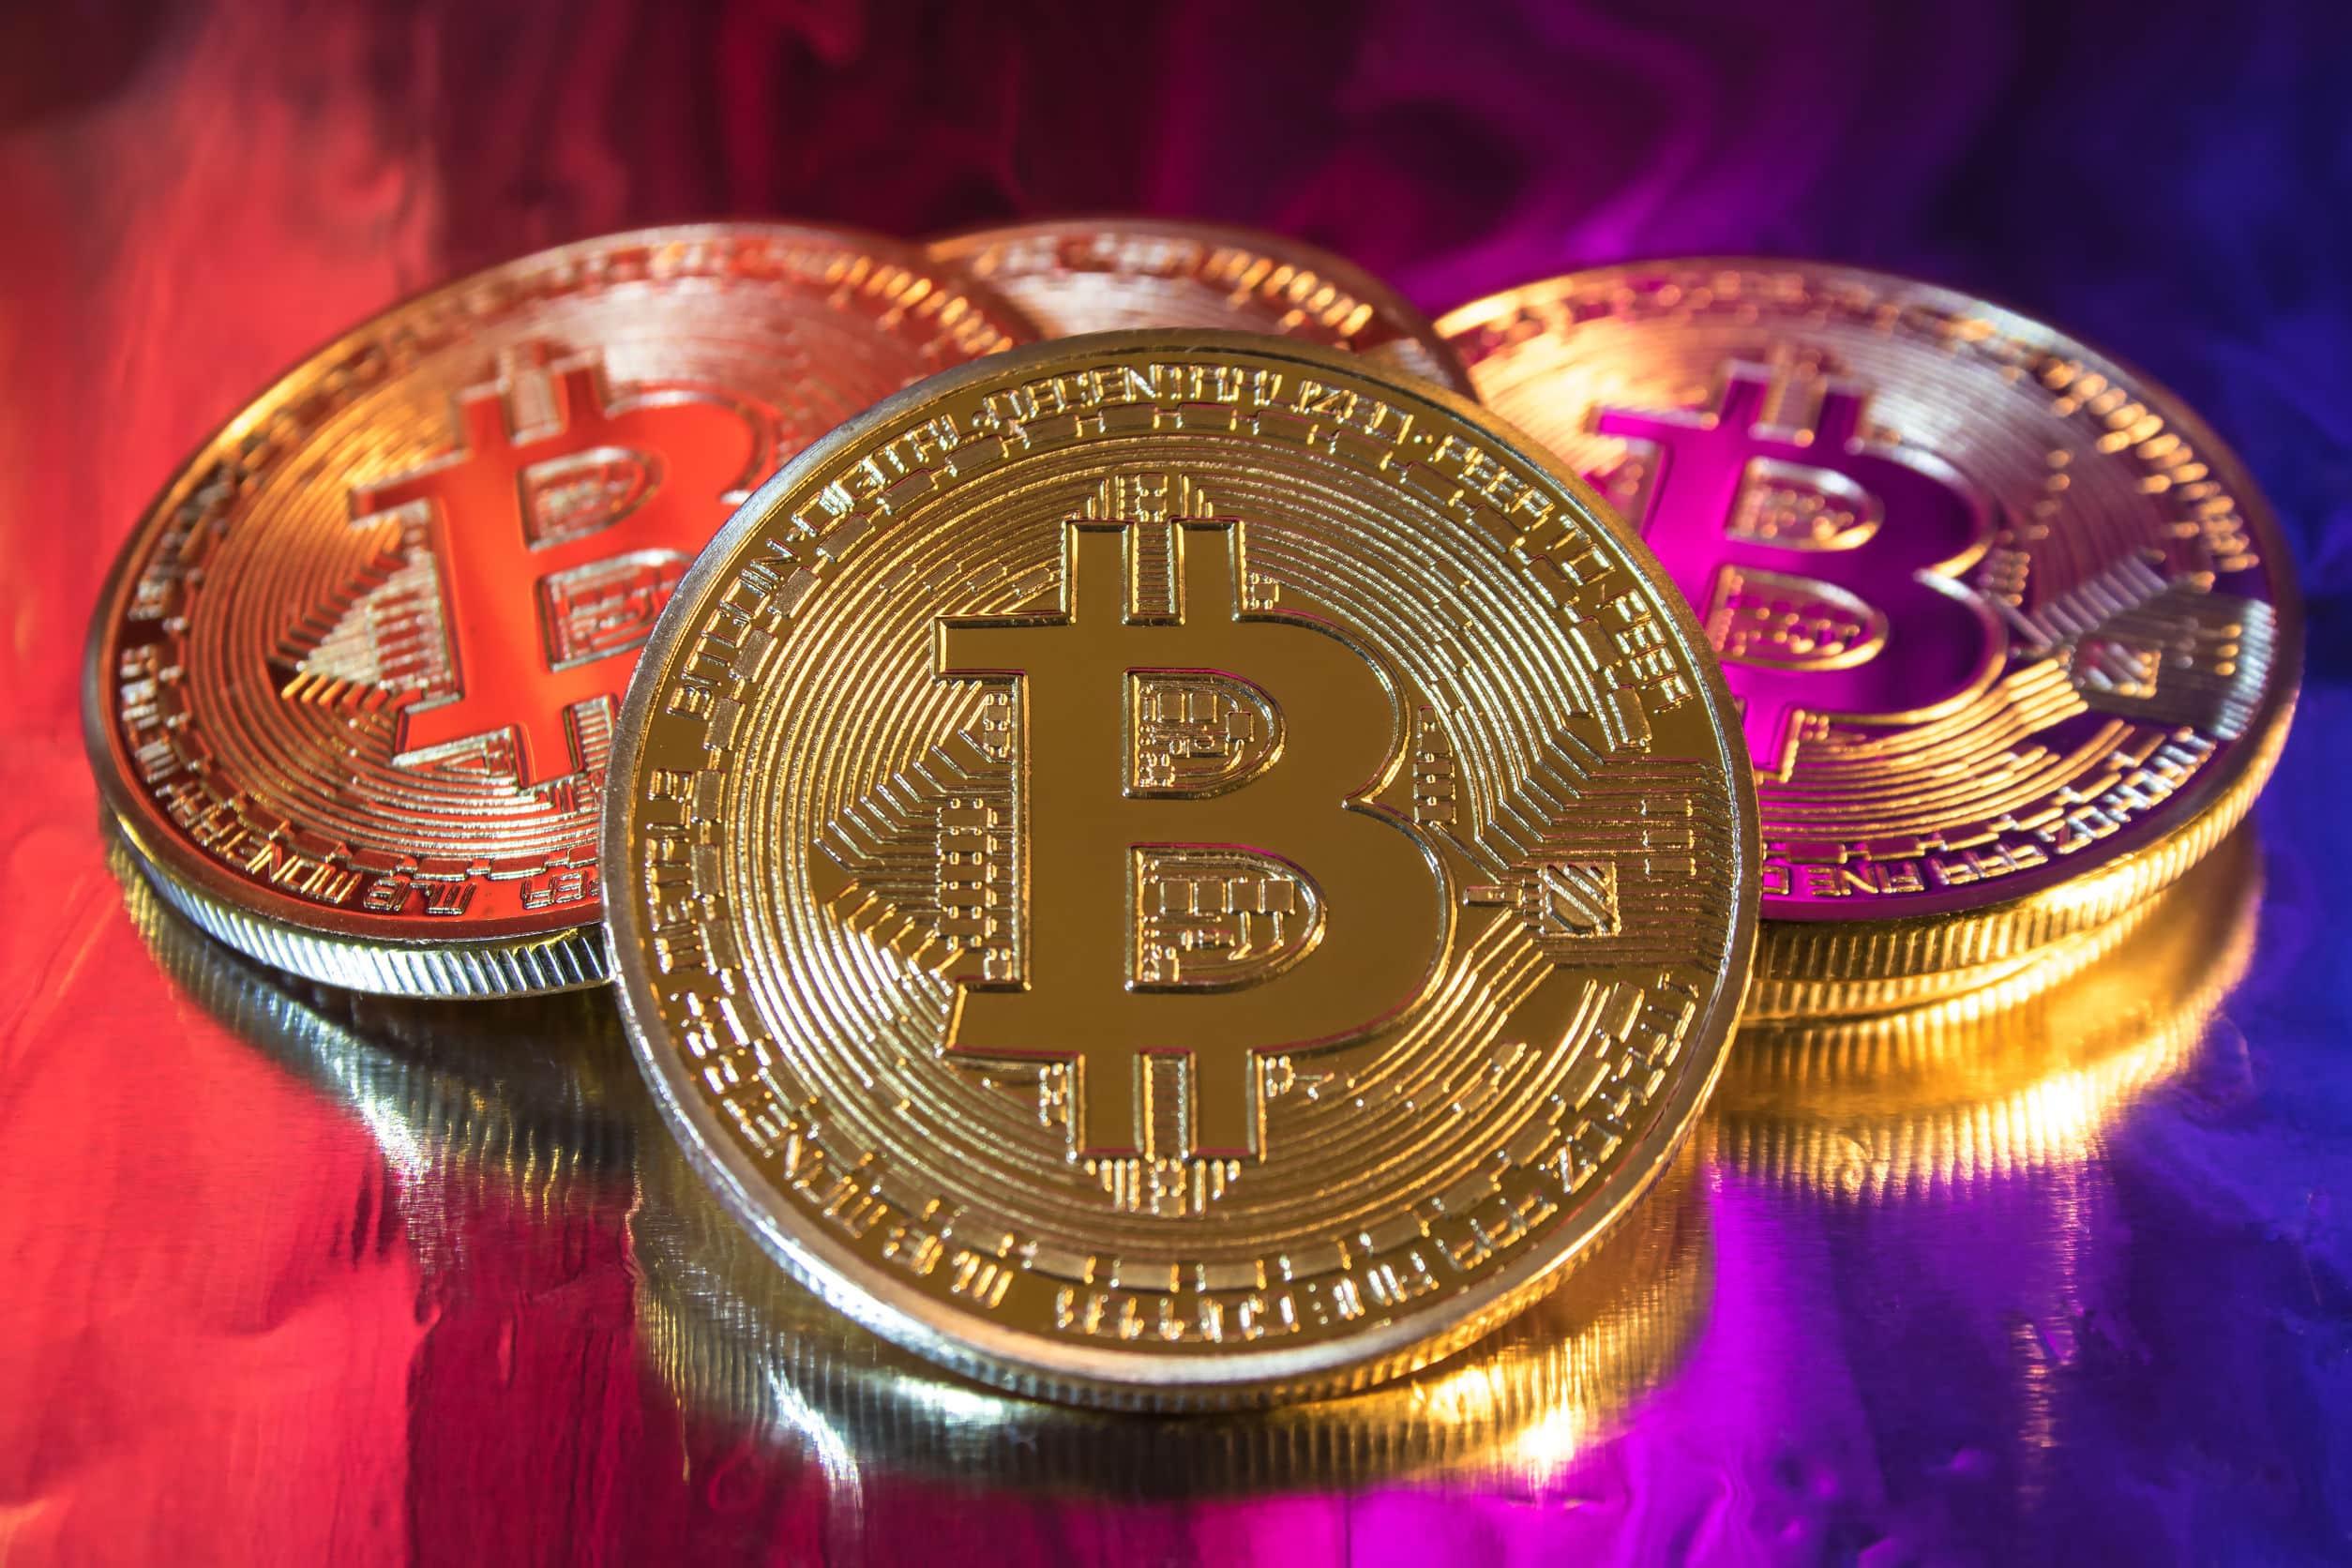 colorful bitcoin